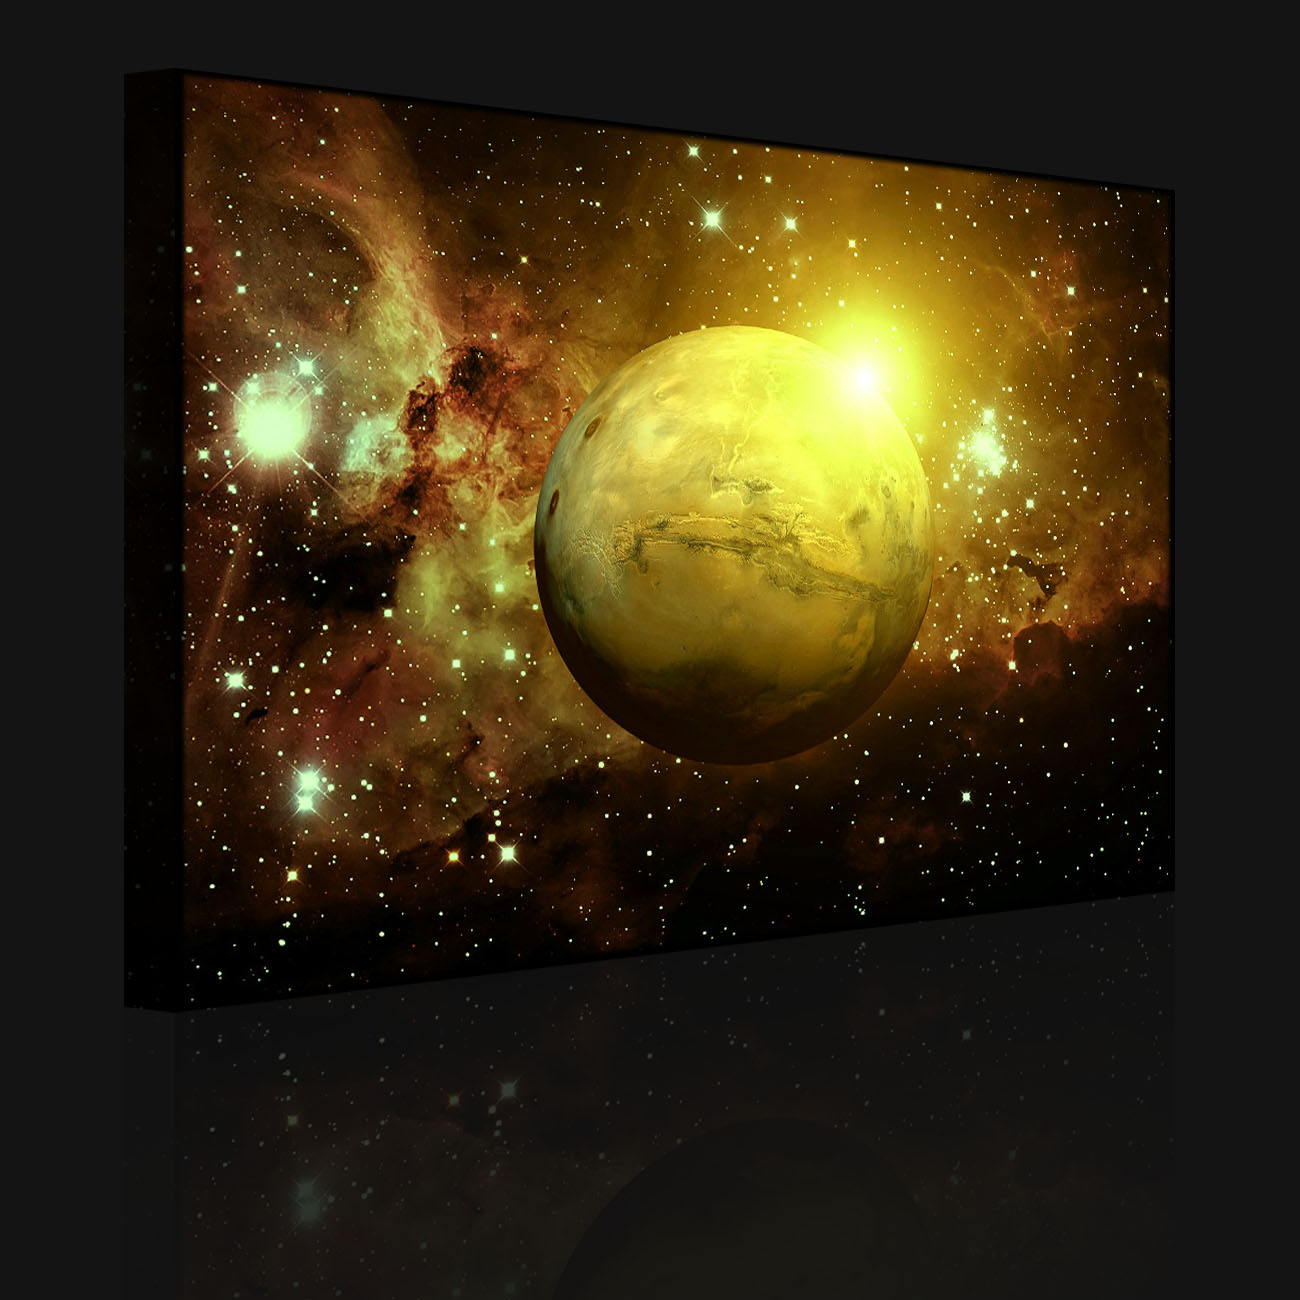 Leuchtbild led bild planet mars im universum front for Dekoration universum